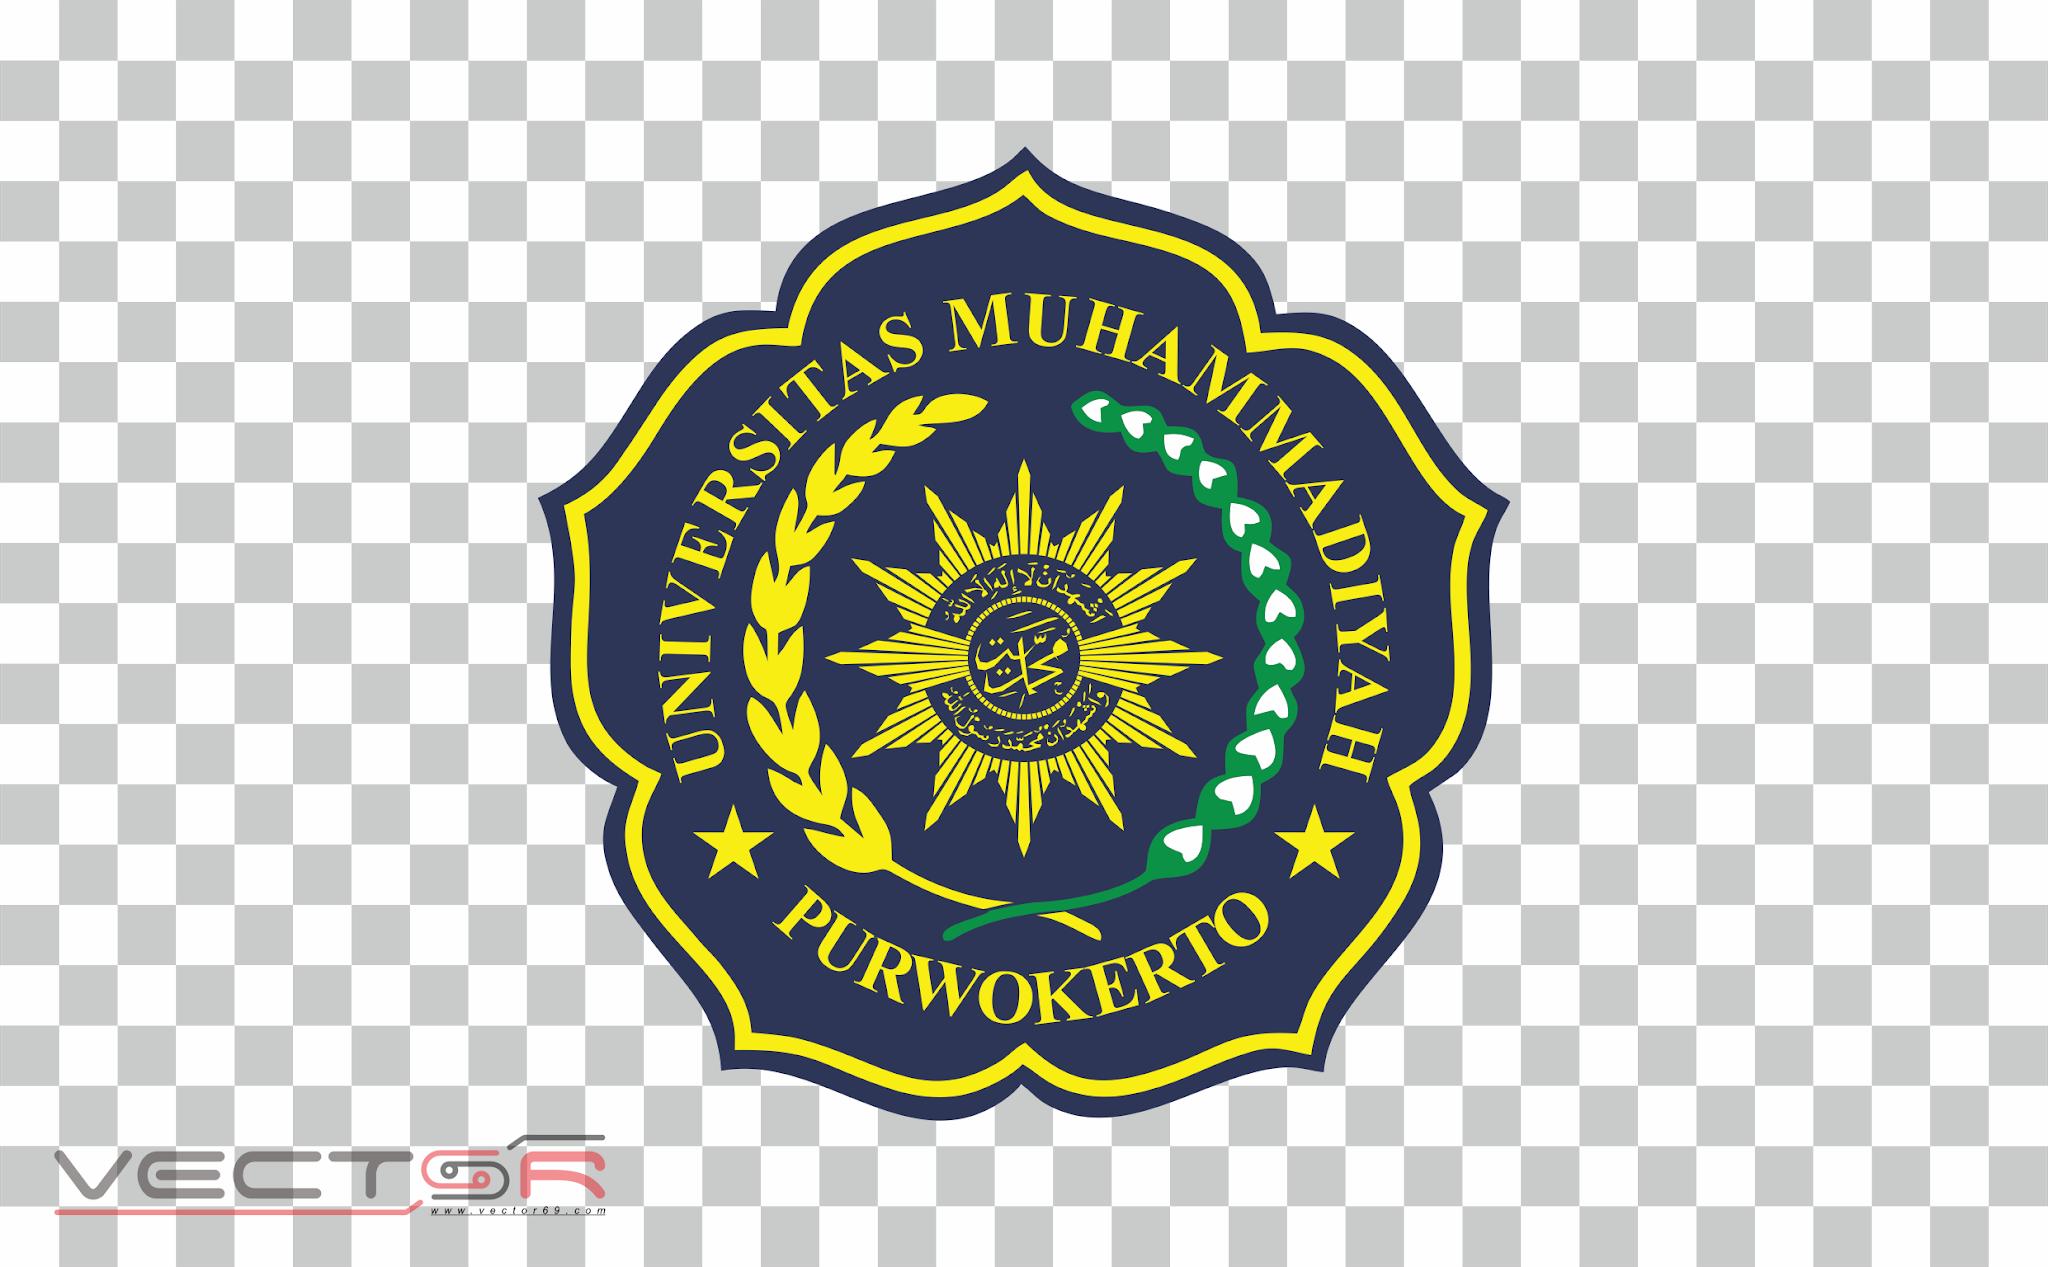 Logo UMP (Universitas Muhammadiyah Purwokerto) - Download .PNG (Portable Network Graphics) Transparent Images